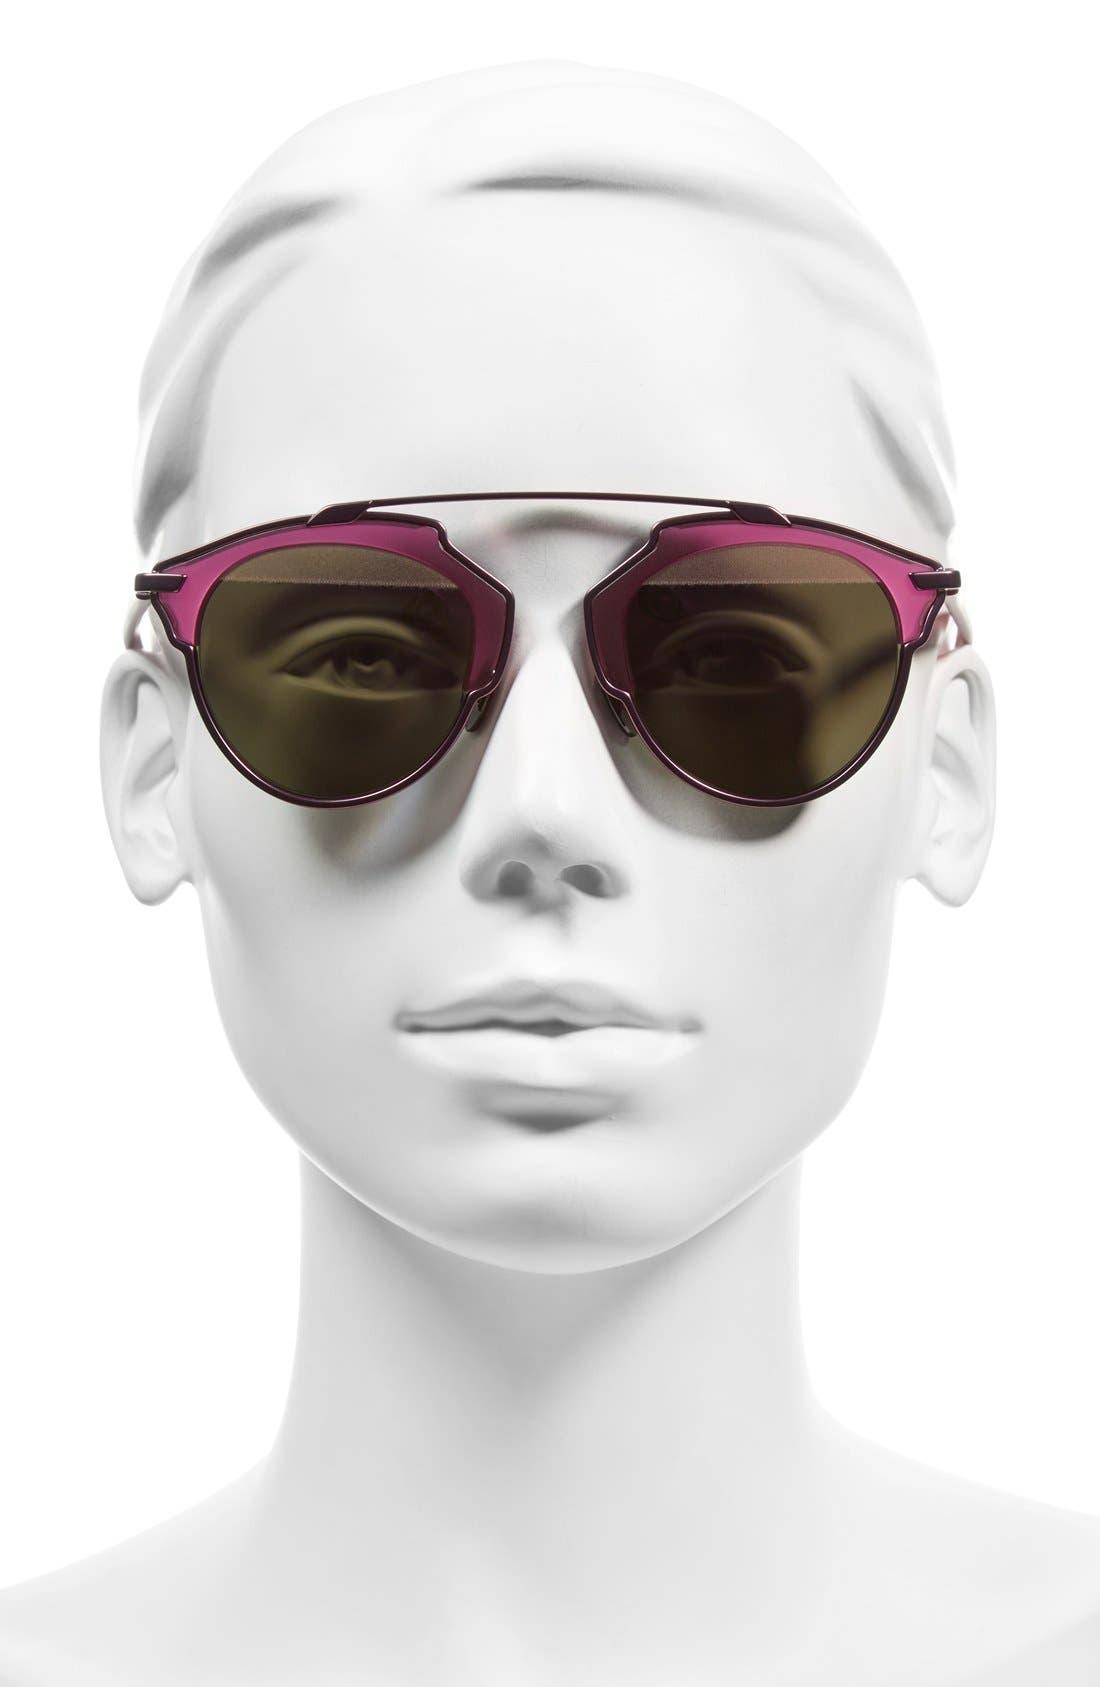 So Real 48mm Brow Bar Sunglasses,                             Alternate thumbnail 45, color,